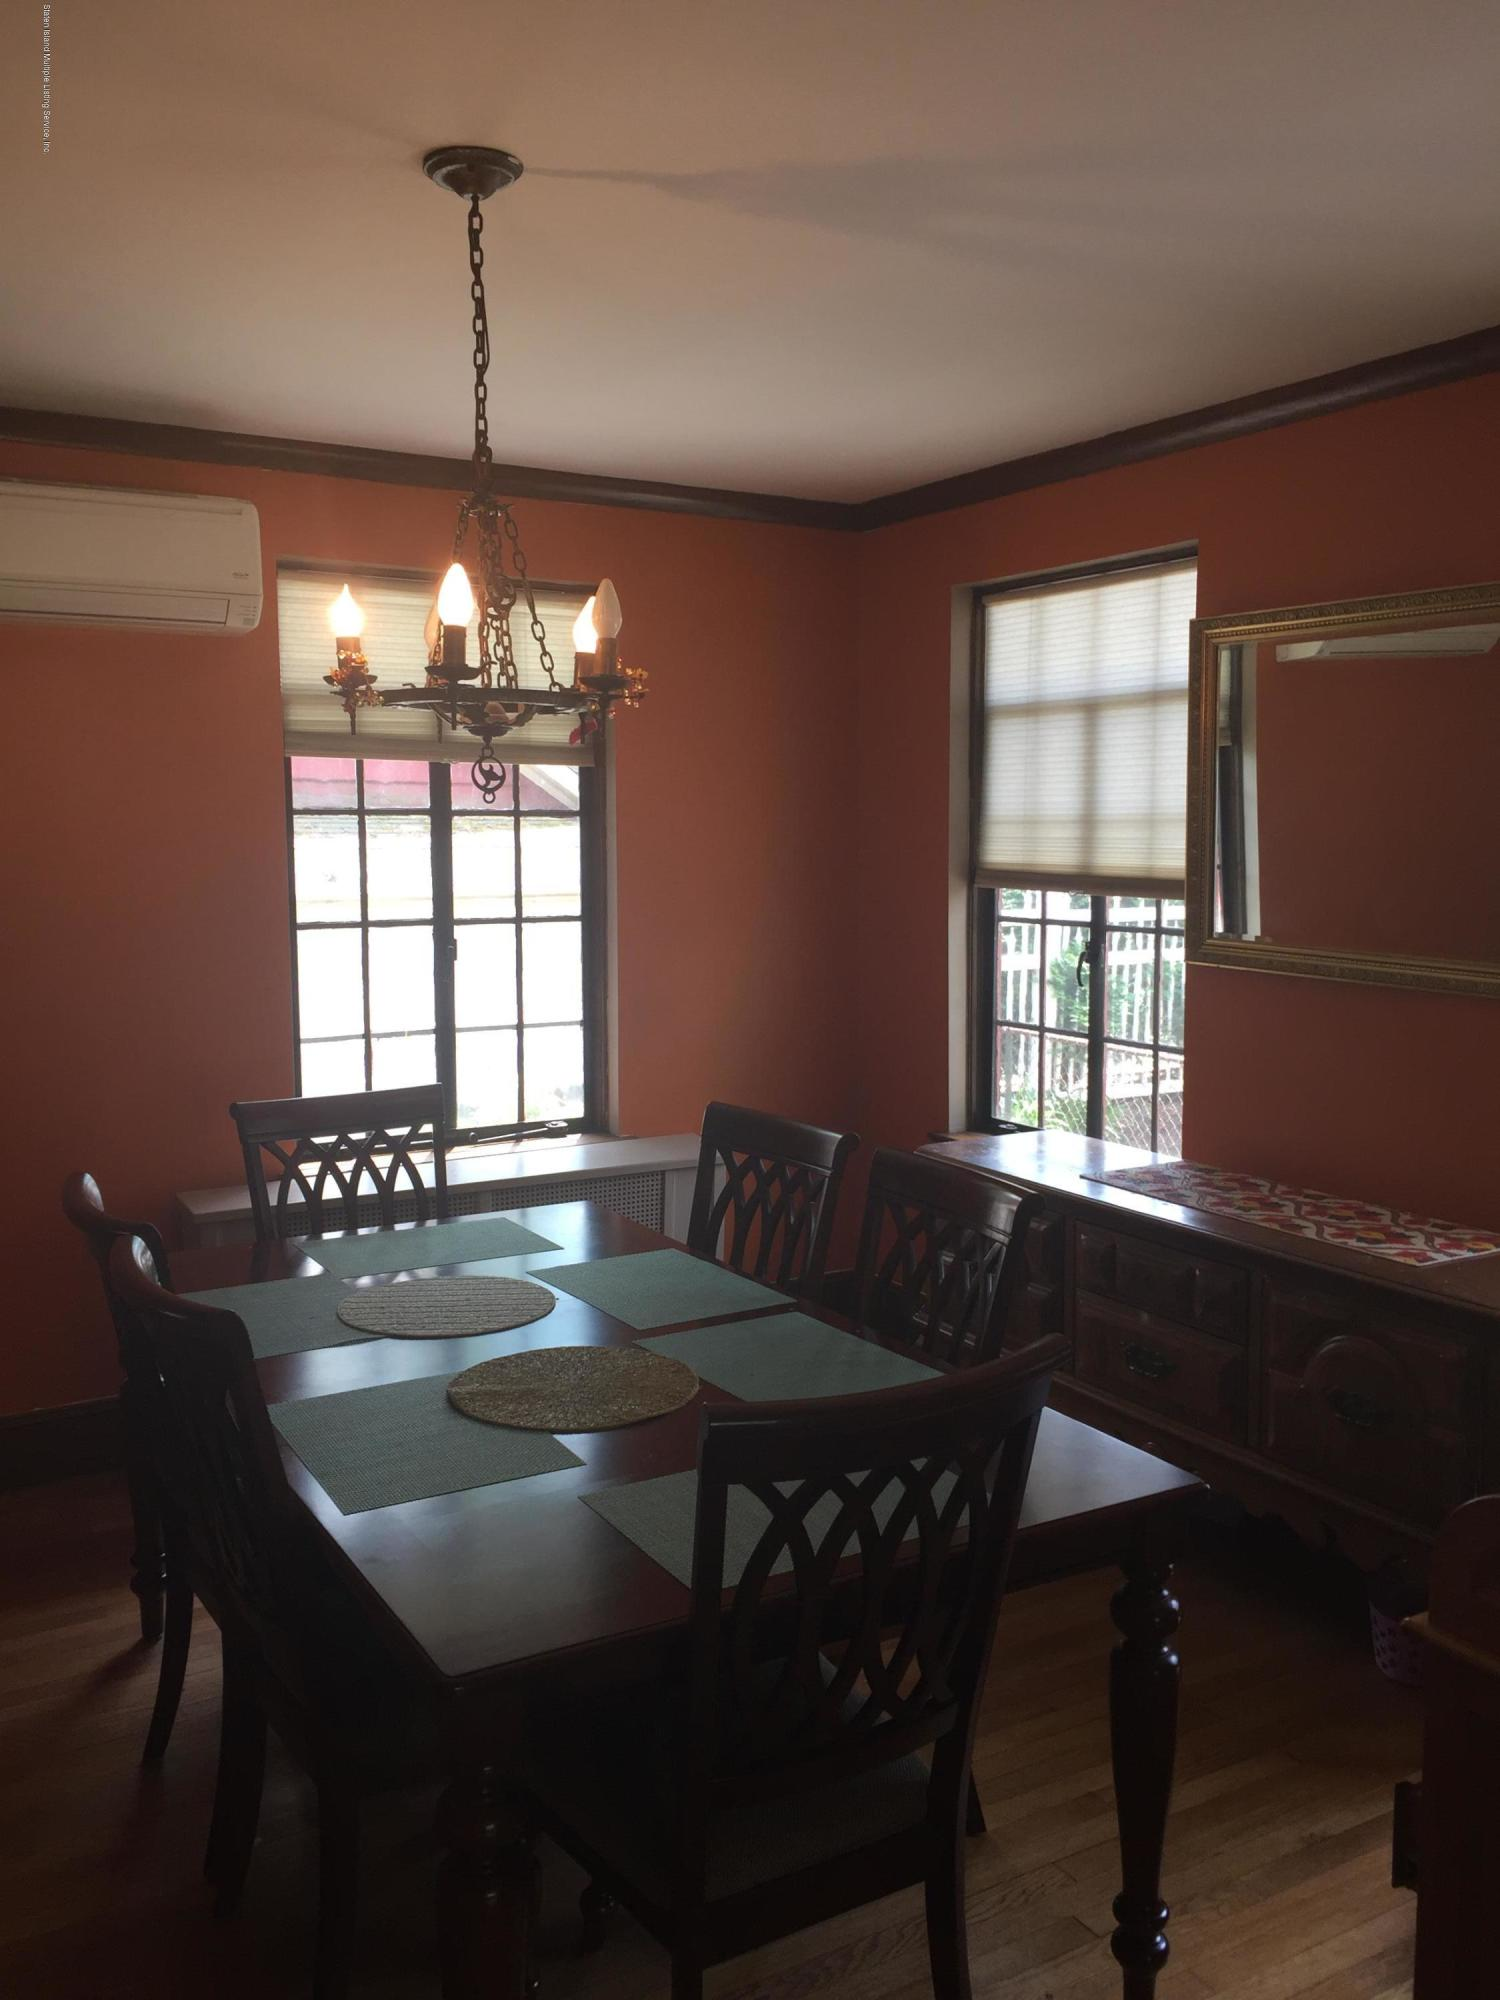 Single Family - Detached 48 Park Court  Staten Island, NY 10301, MLS-1129200-16